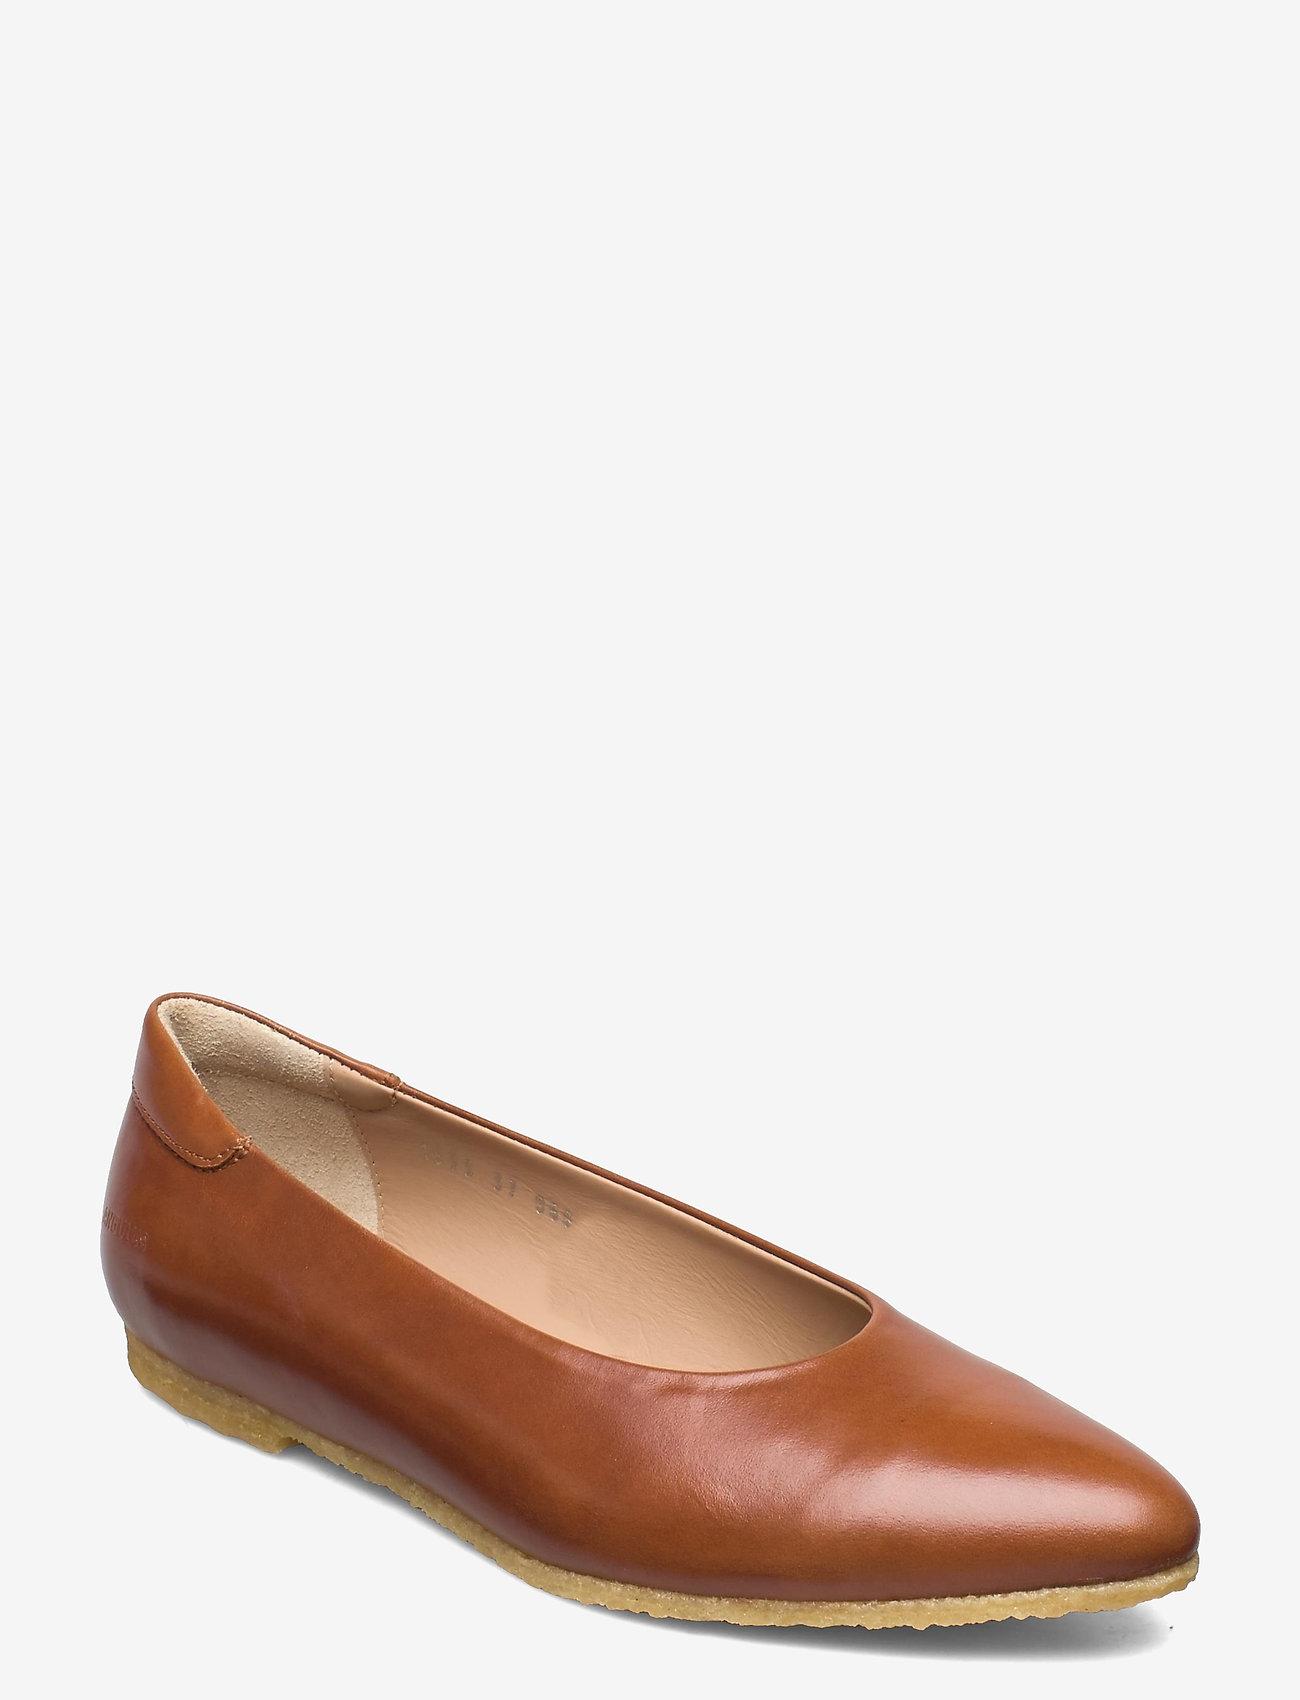 ANGULUS - Ballerina - ballerinas - 1838 cognac - 0